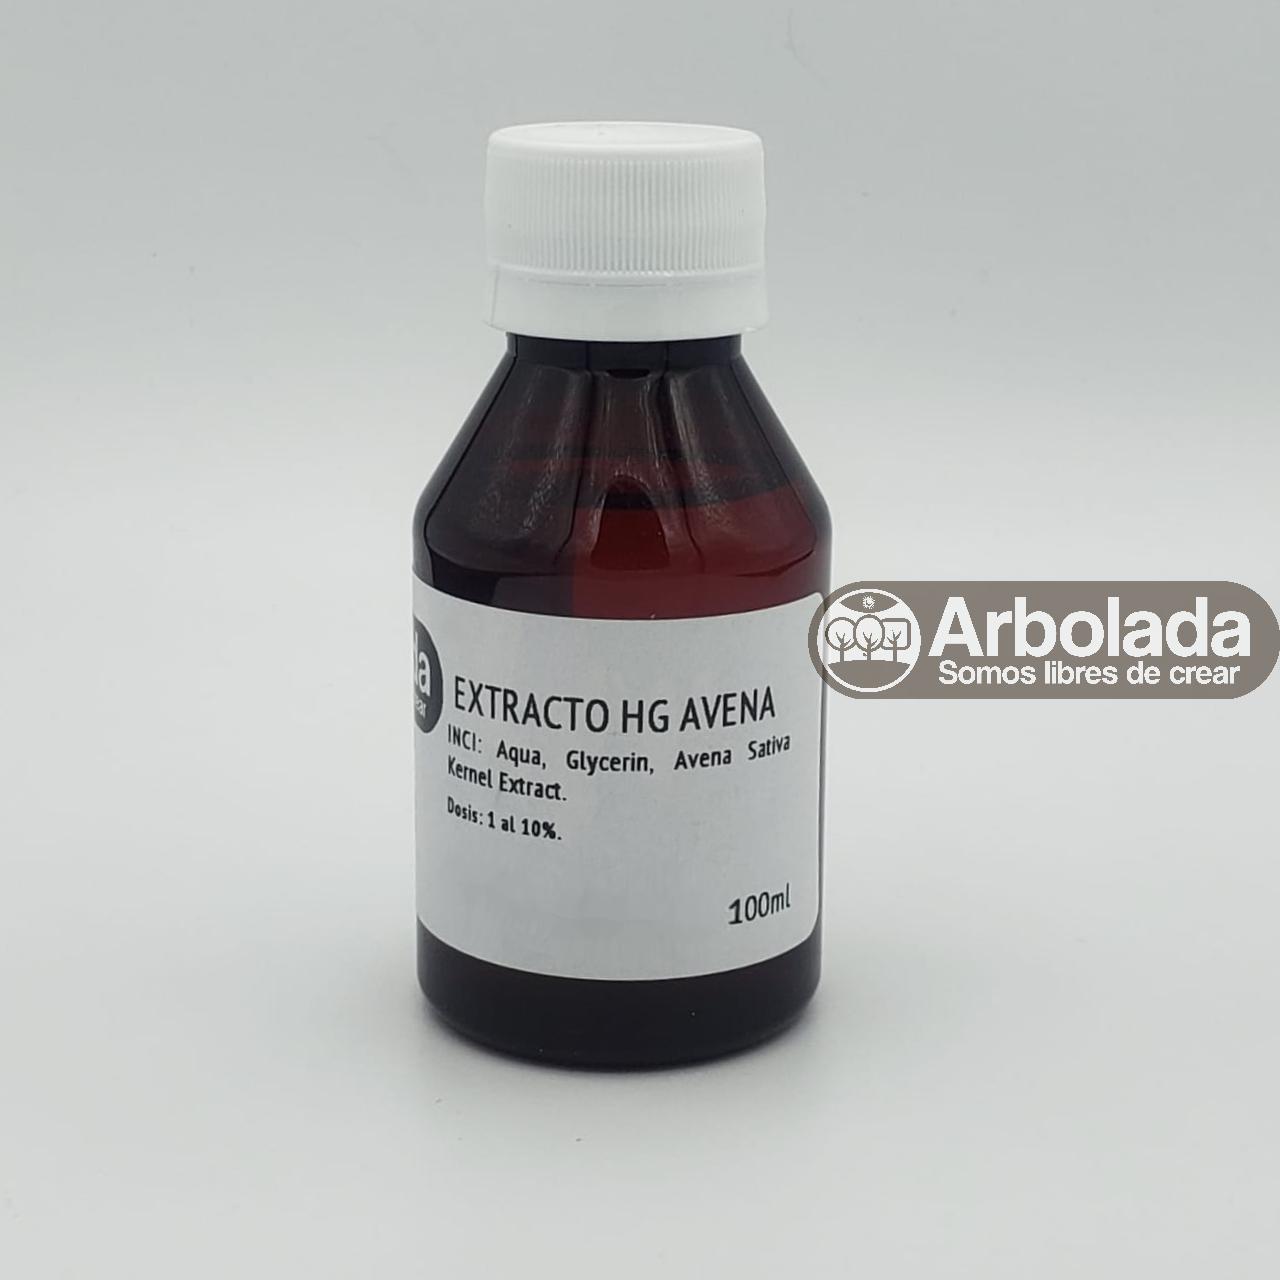 Extracto HG de Avena 100ml